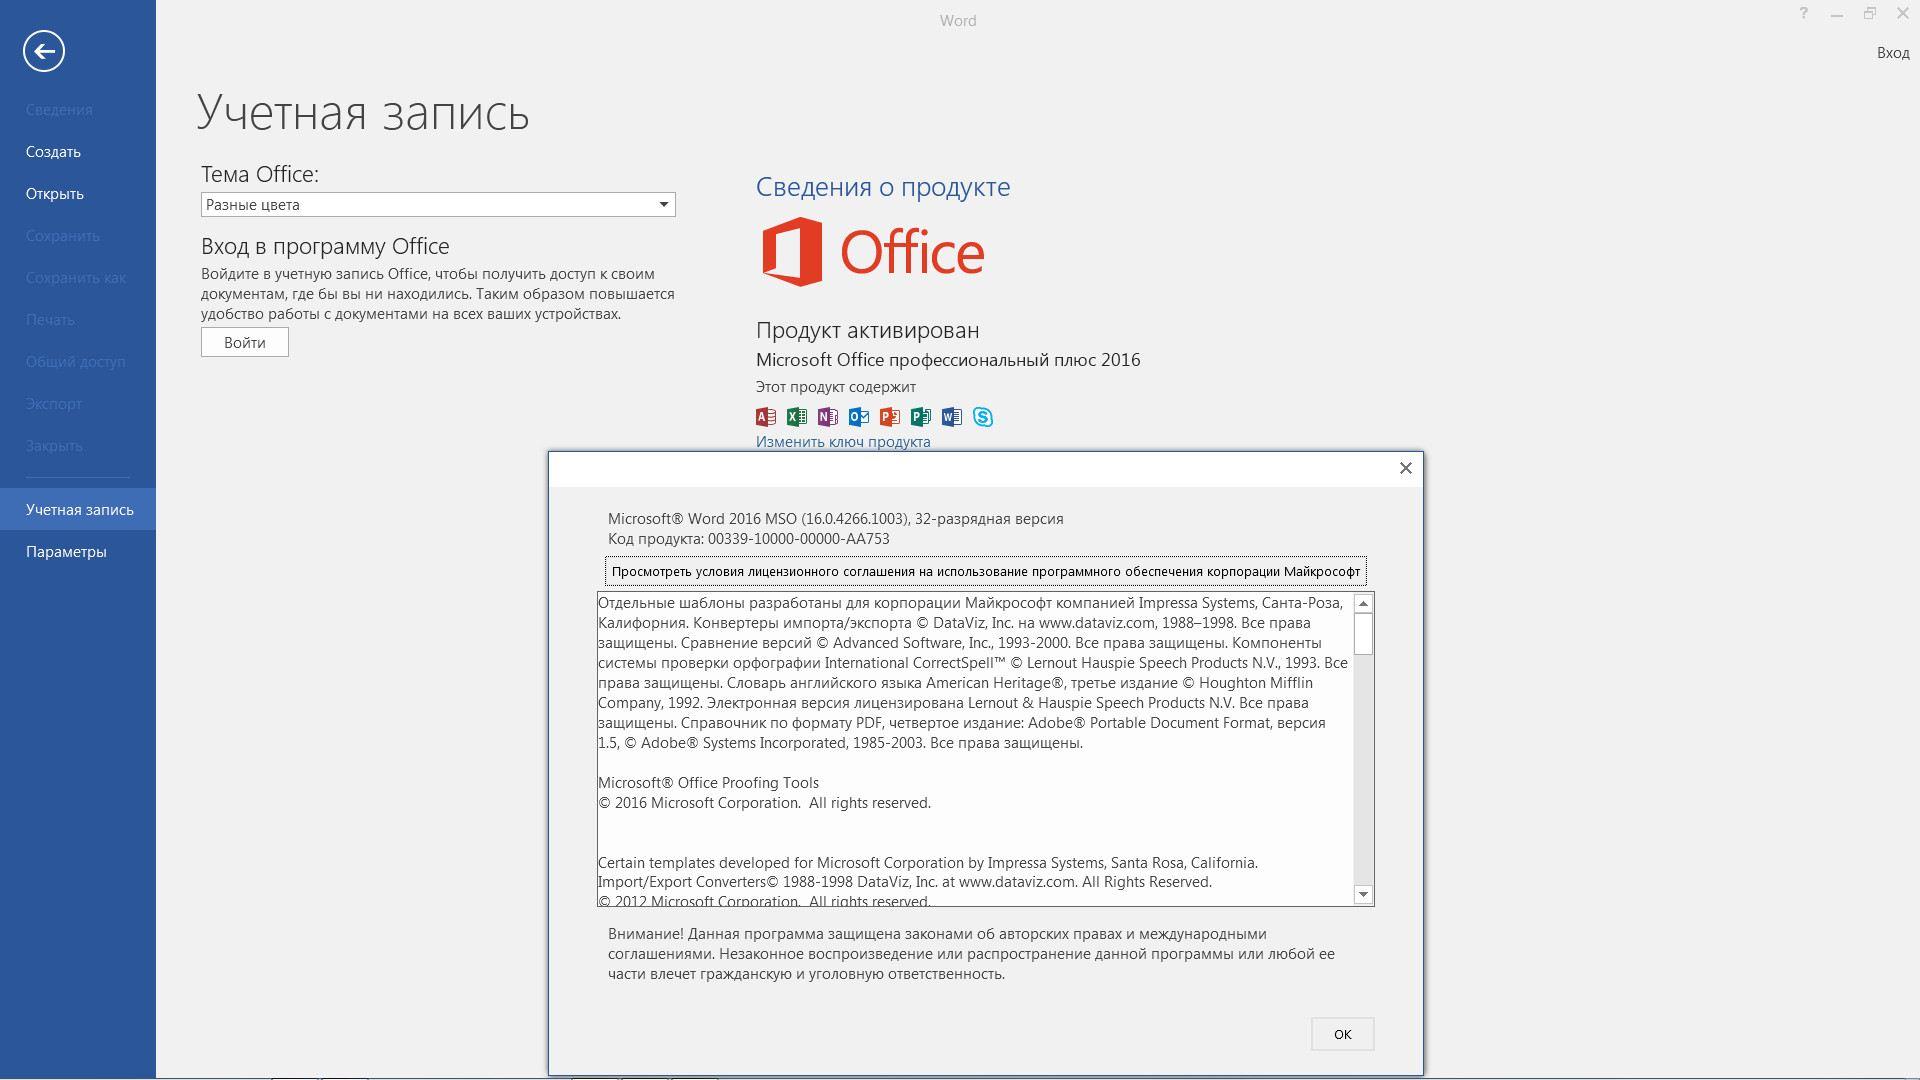 ... Microsoft Office 2016 Professional Plus RTM 16.0.4266.1003 (x86/x64